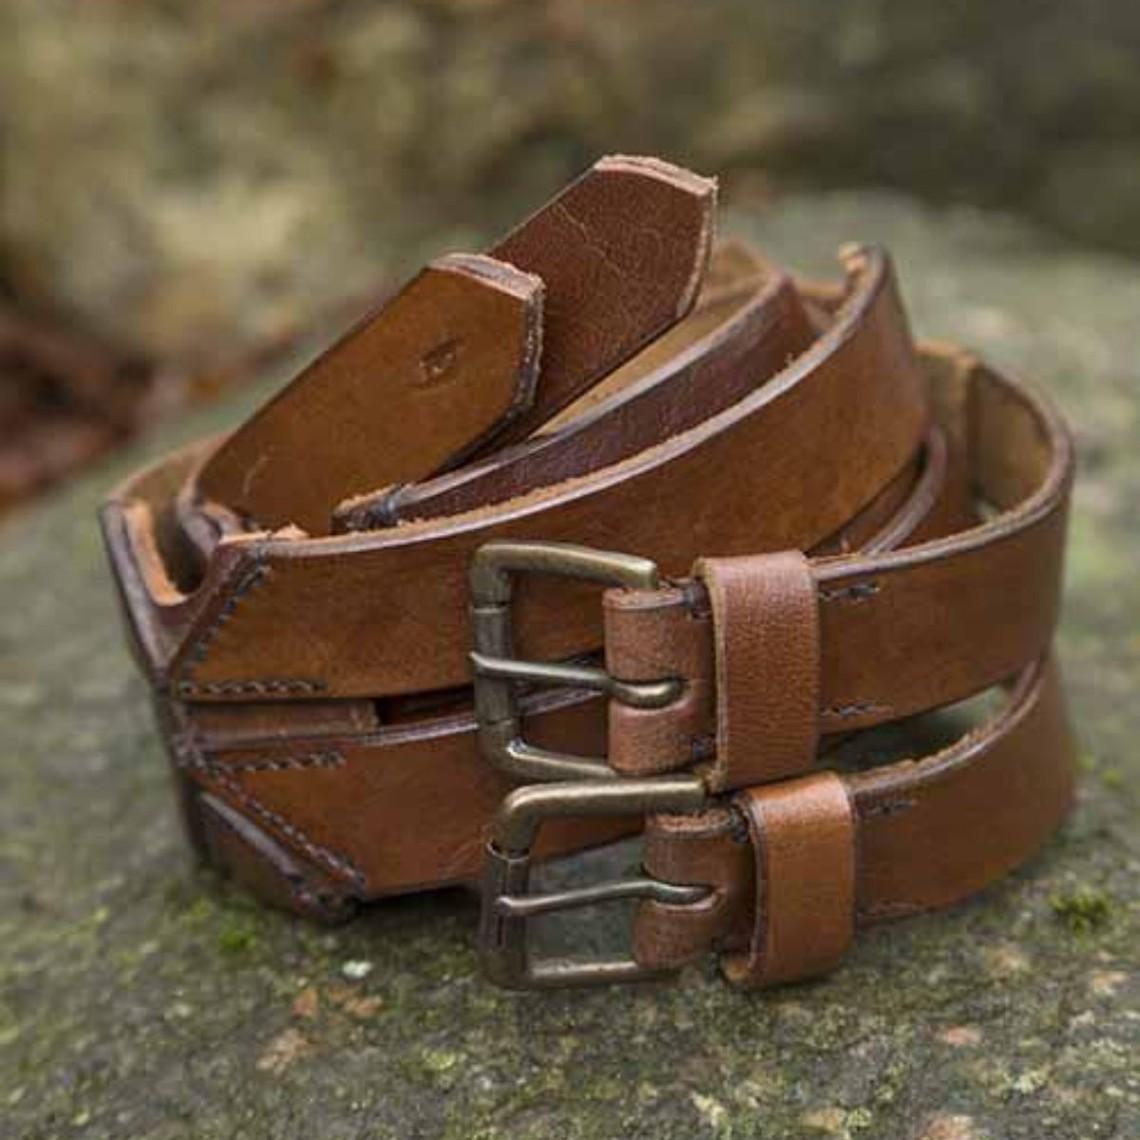 Epic Armoury Cinturón X doble, marrón